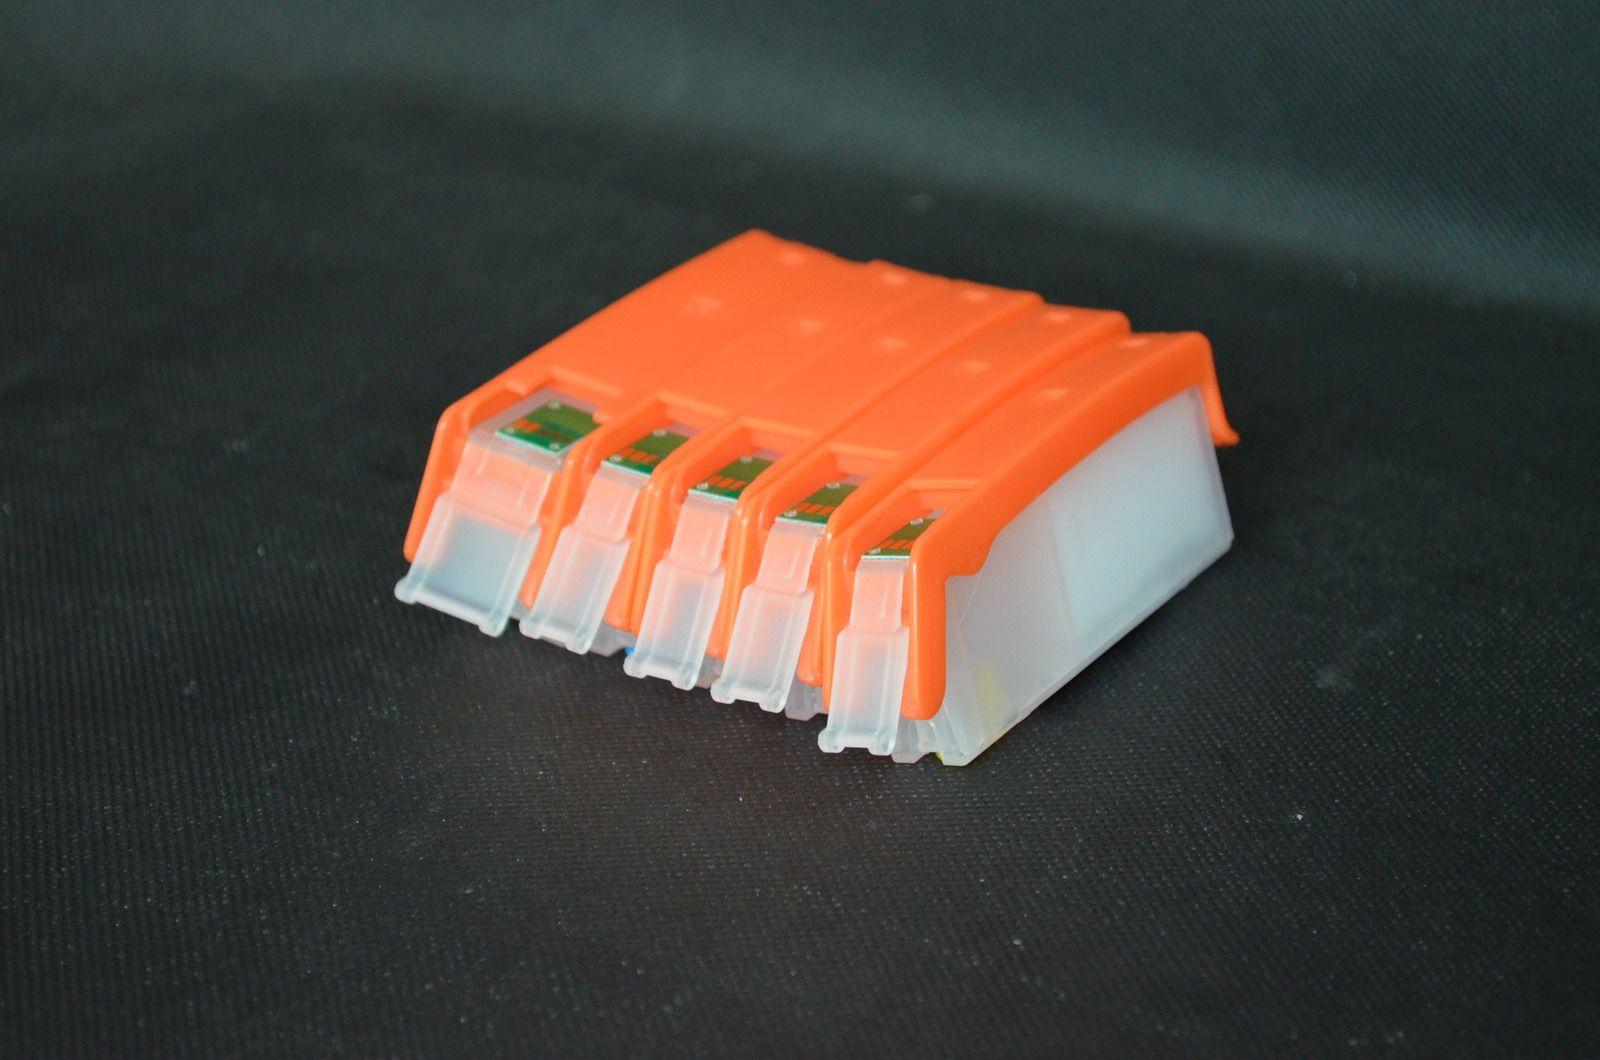 ПГИ-750XL Кинк-751XL refillable патрон чернил для канона PIXMA IP7270/MG6370/MG5470/MX727/MX927/MG7170/ MG5570 с Arc чип